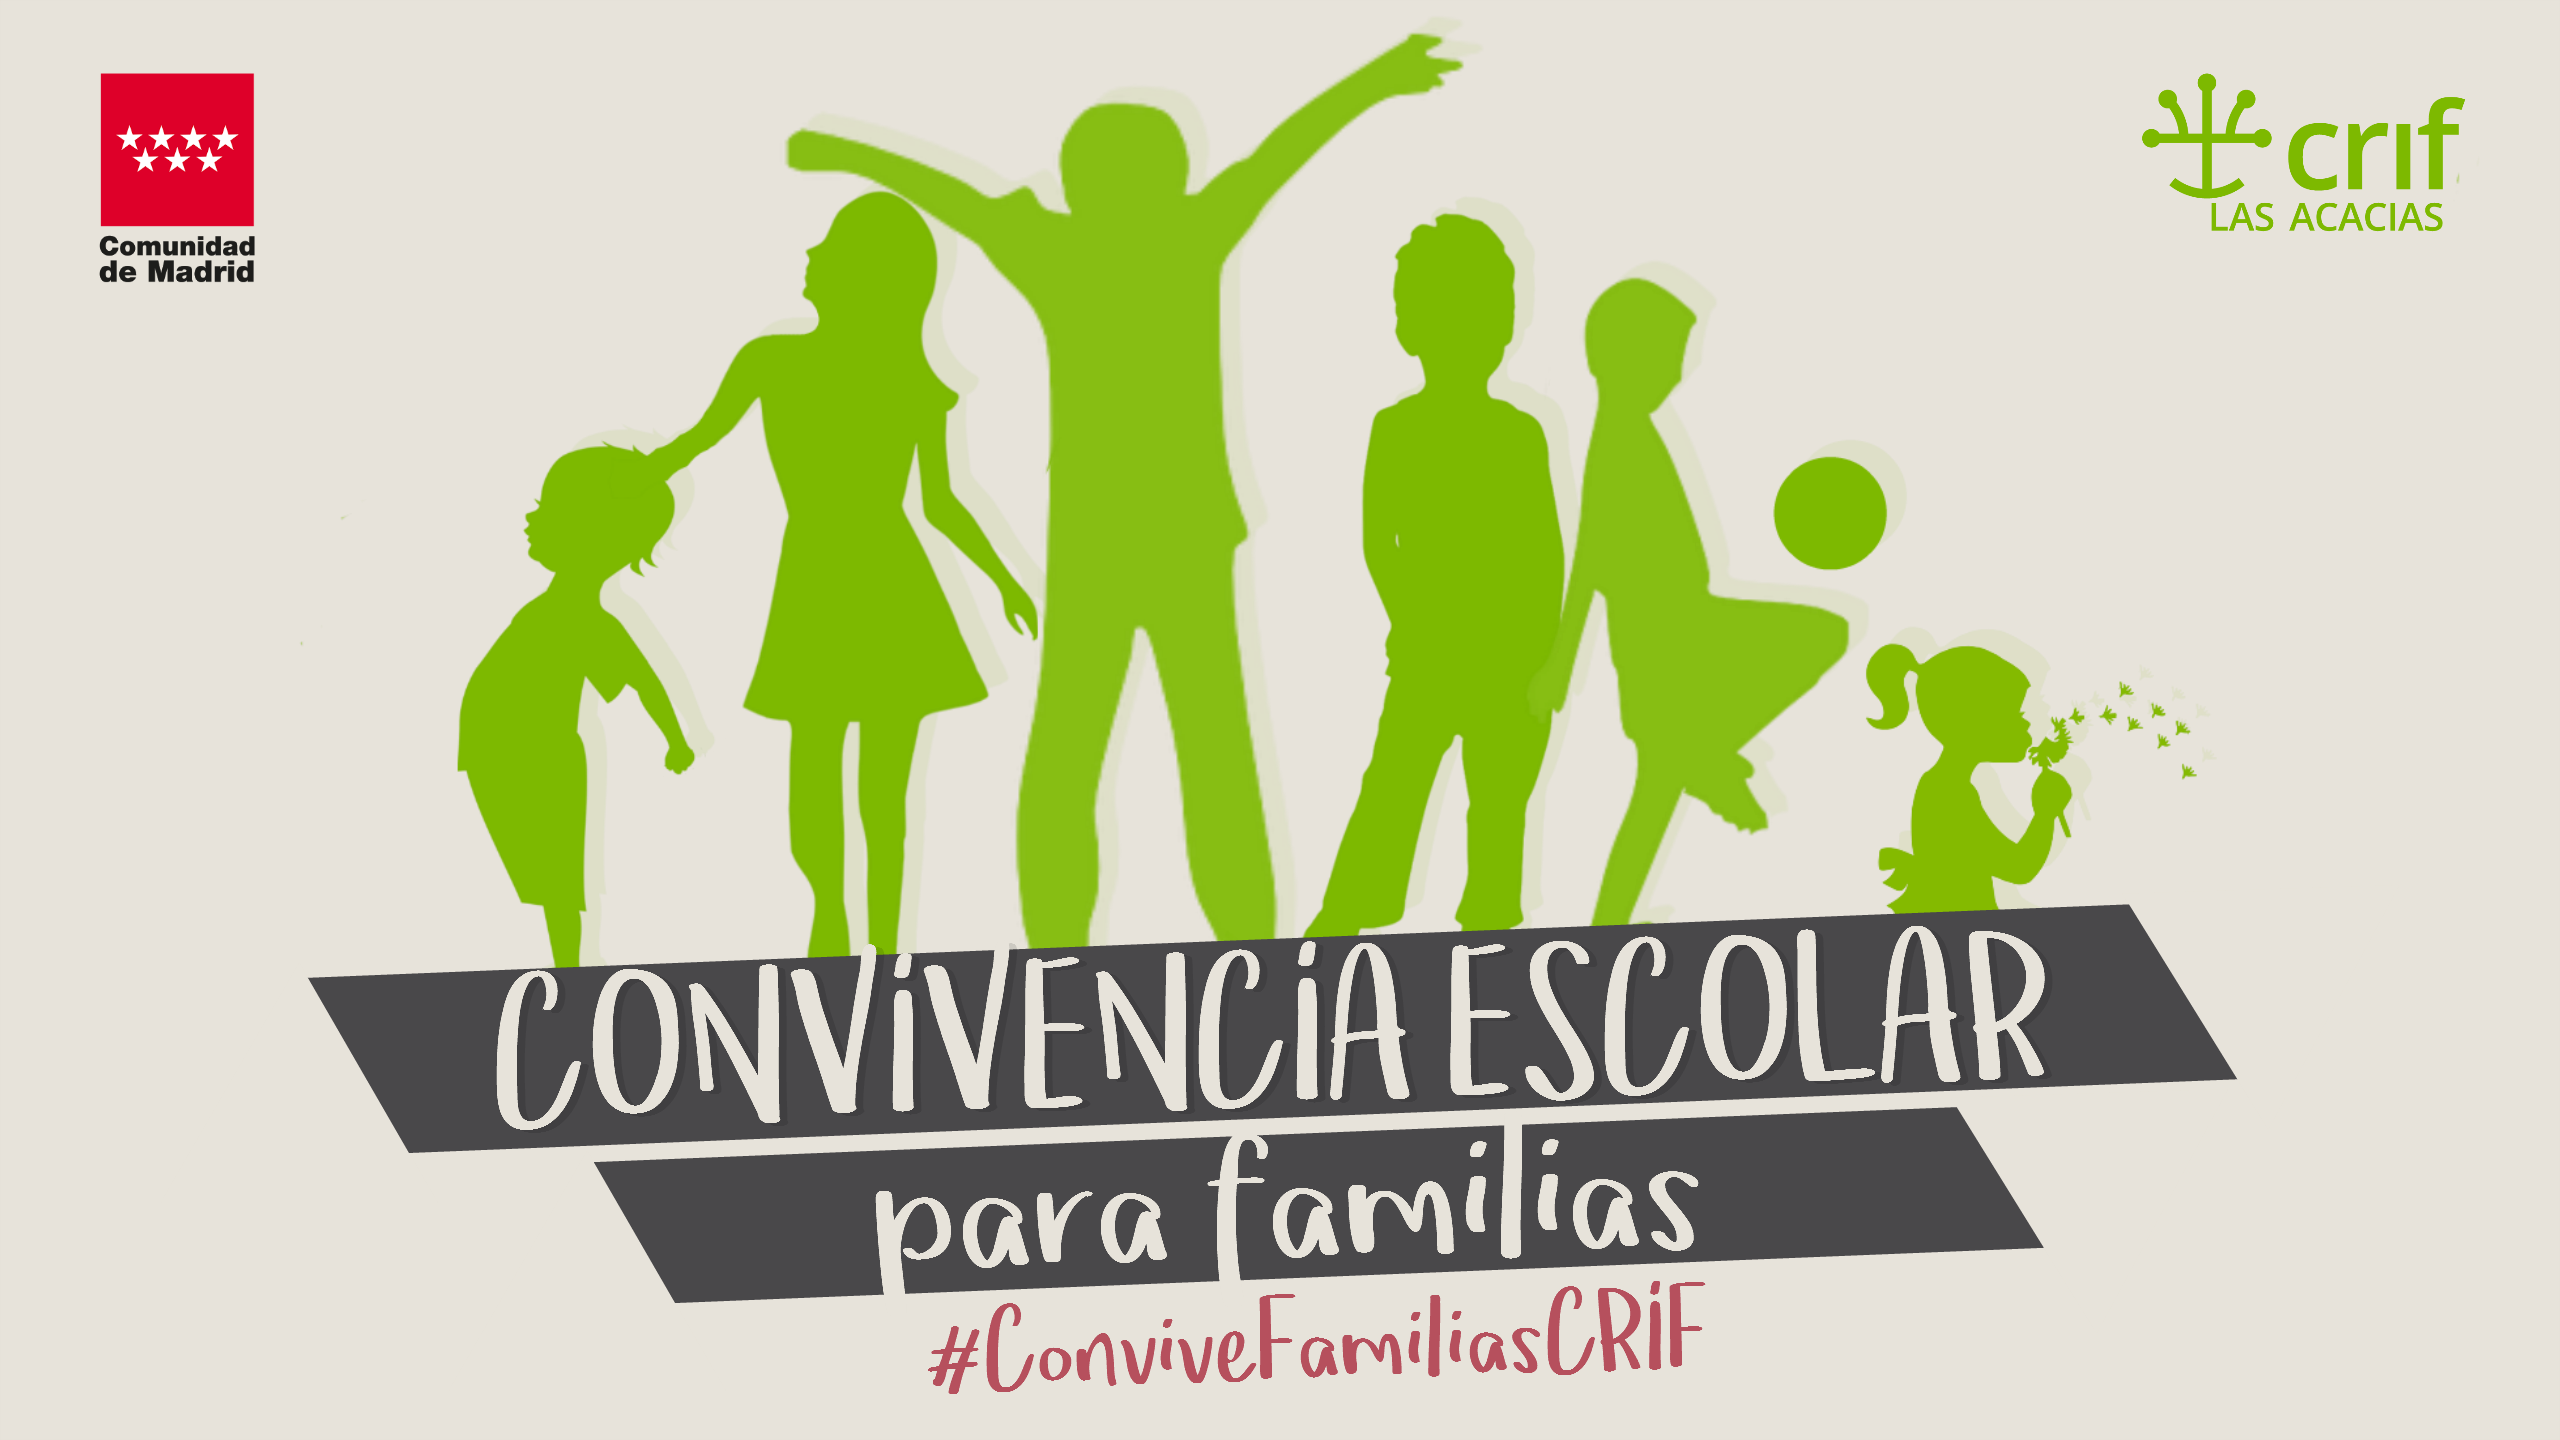 asset-v1-crif_las_acaciasmooc032017type@assetblock@cabecera_niños1.png.png